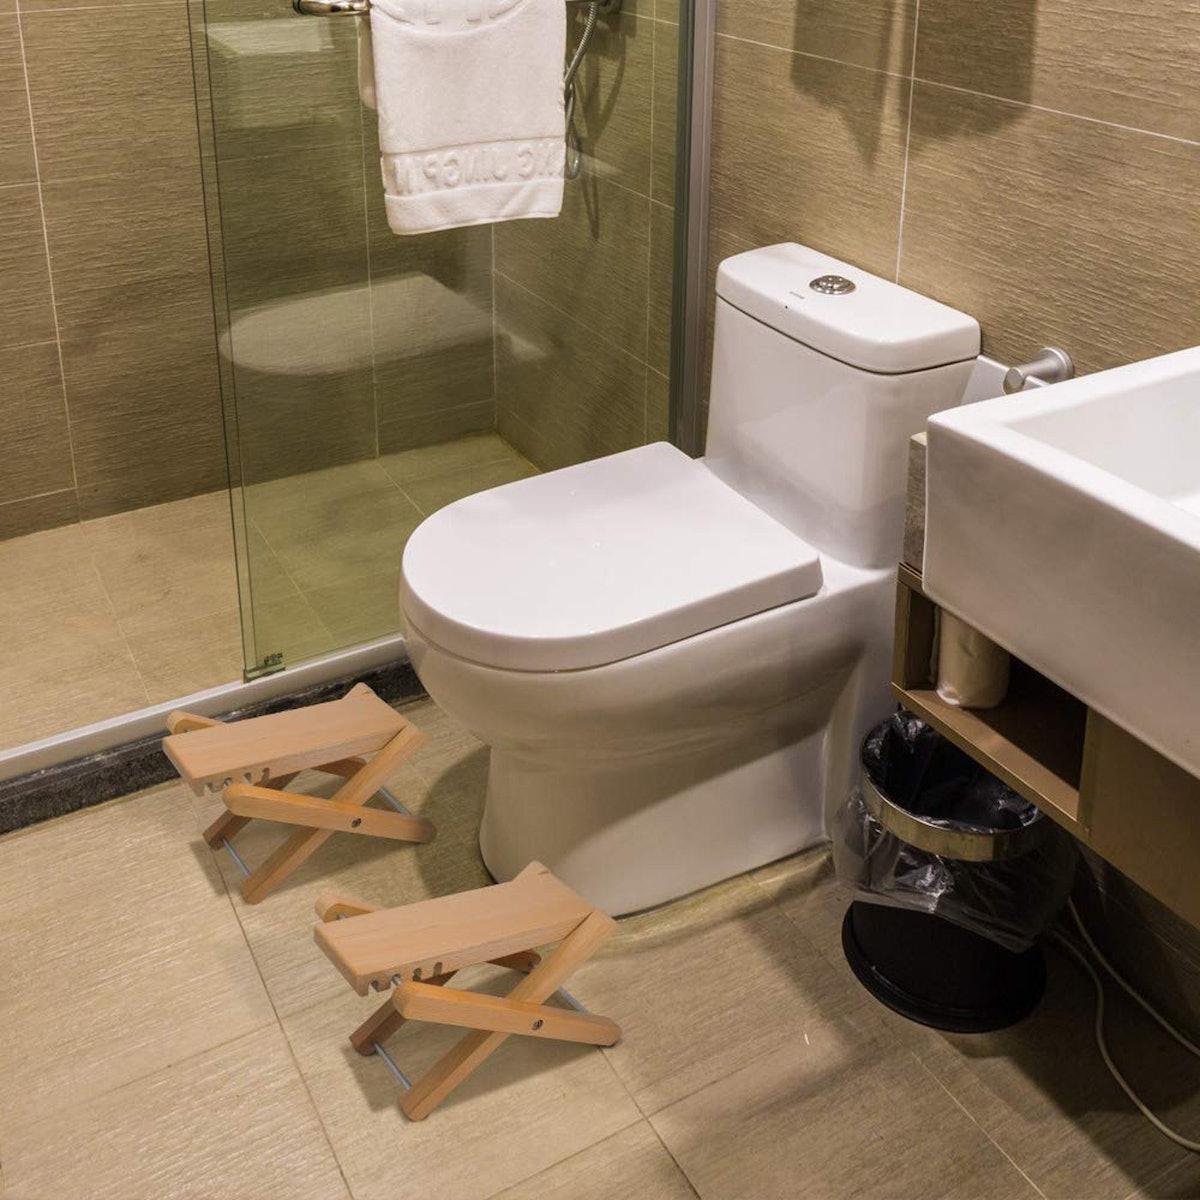 Taillansin Squatting Toilet Steps